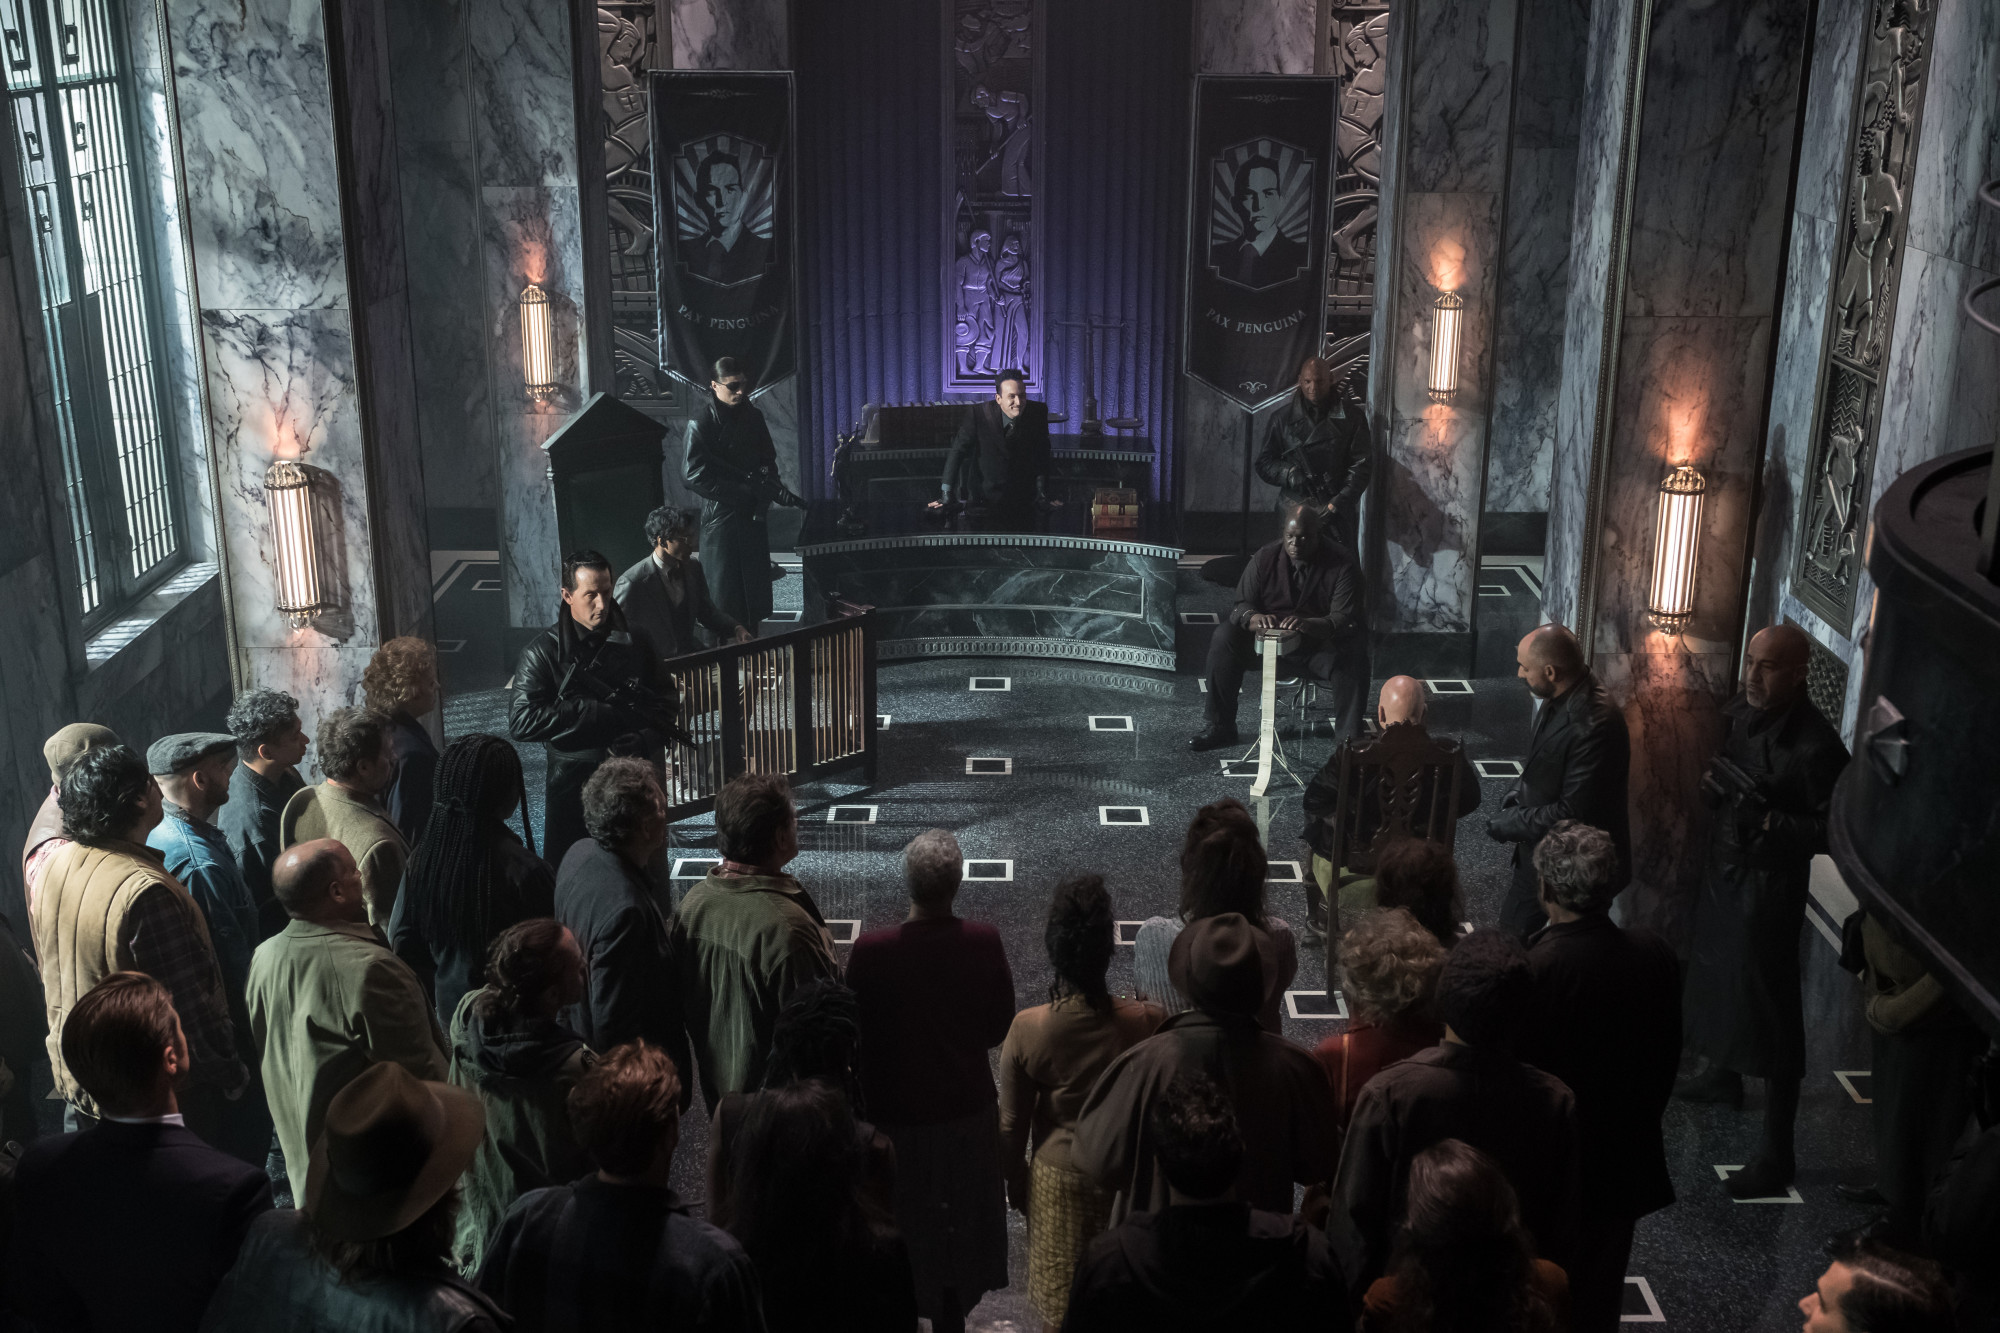 Gotham-504_SCN28_JN0025_f_webres